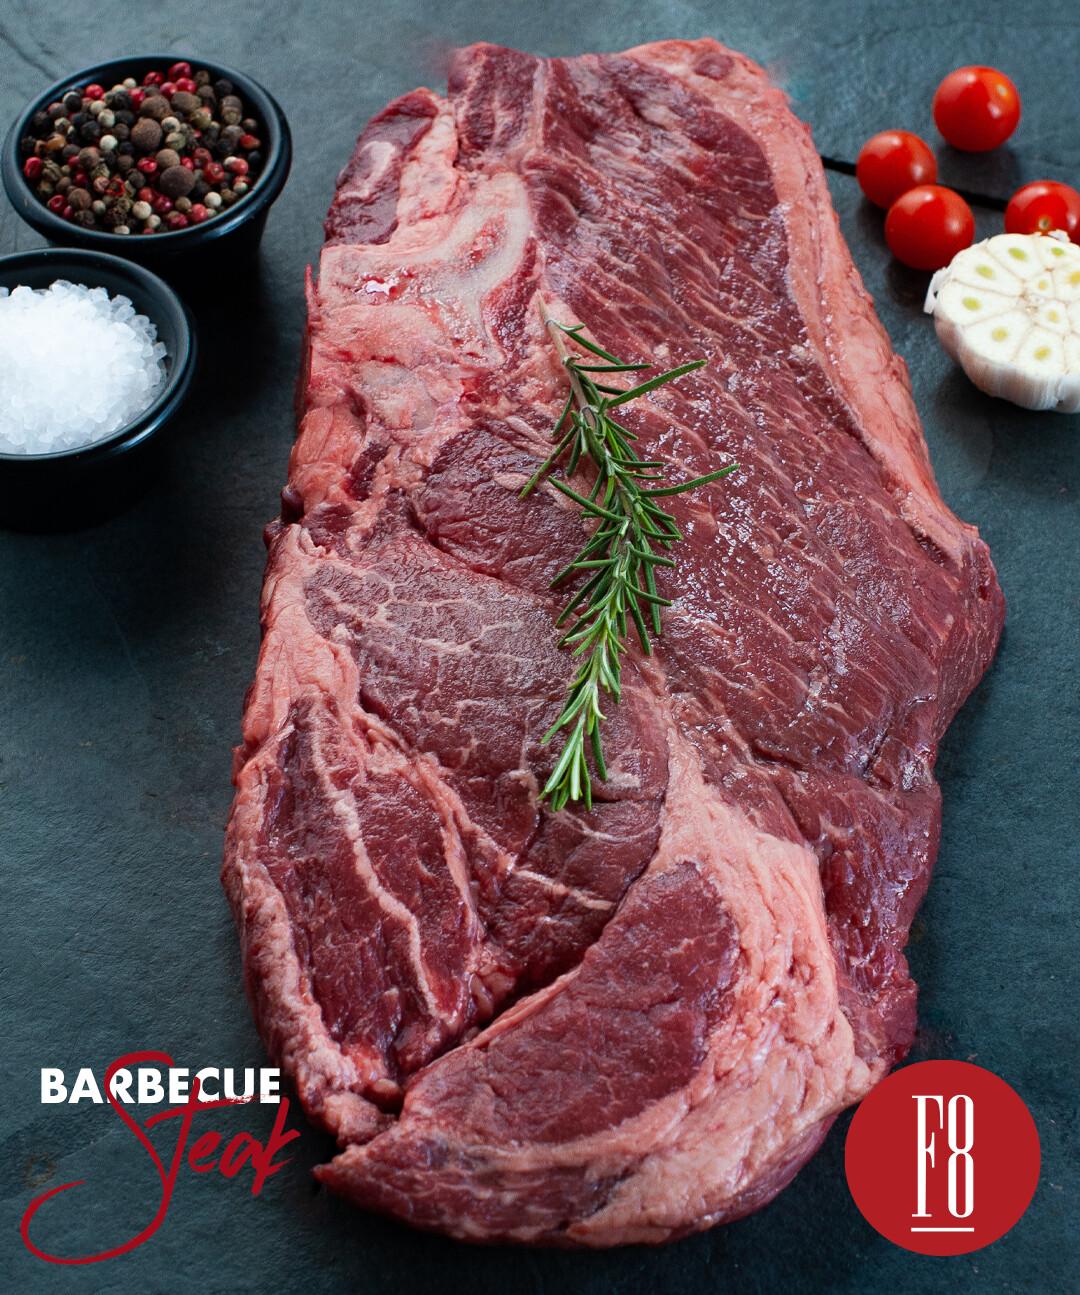 Barbecue Aprox 3 - 3.3 Lb (Congelado)